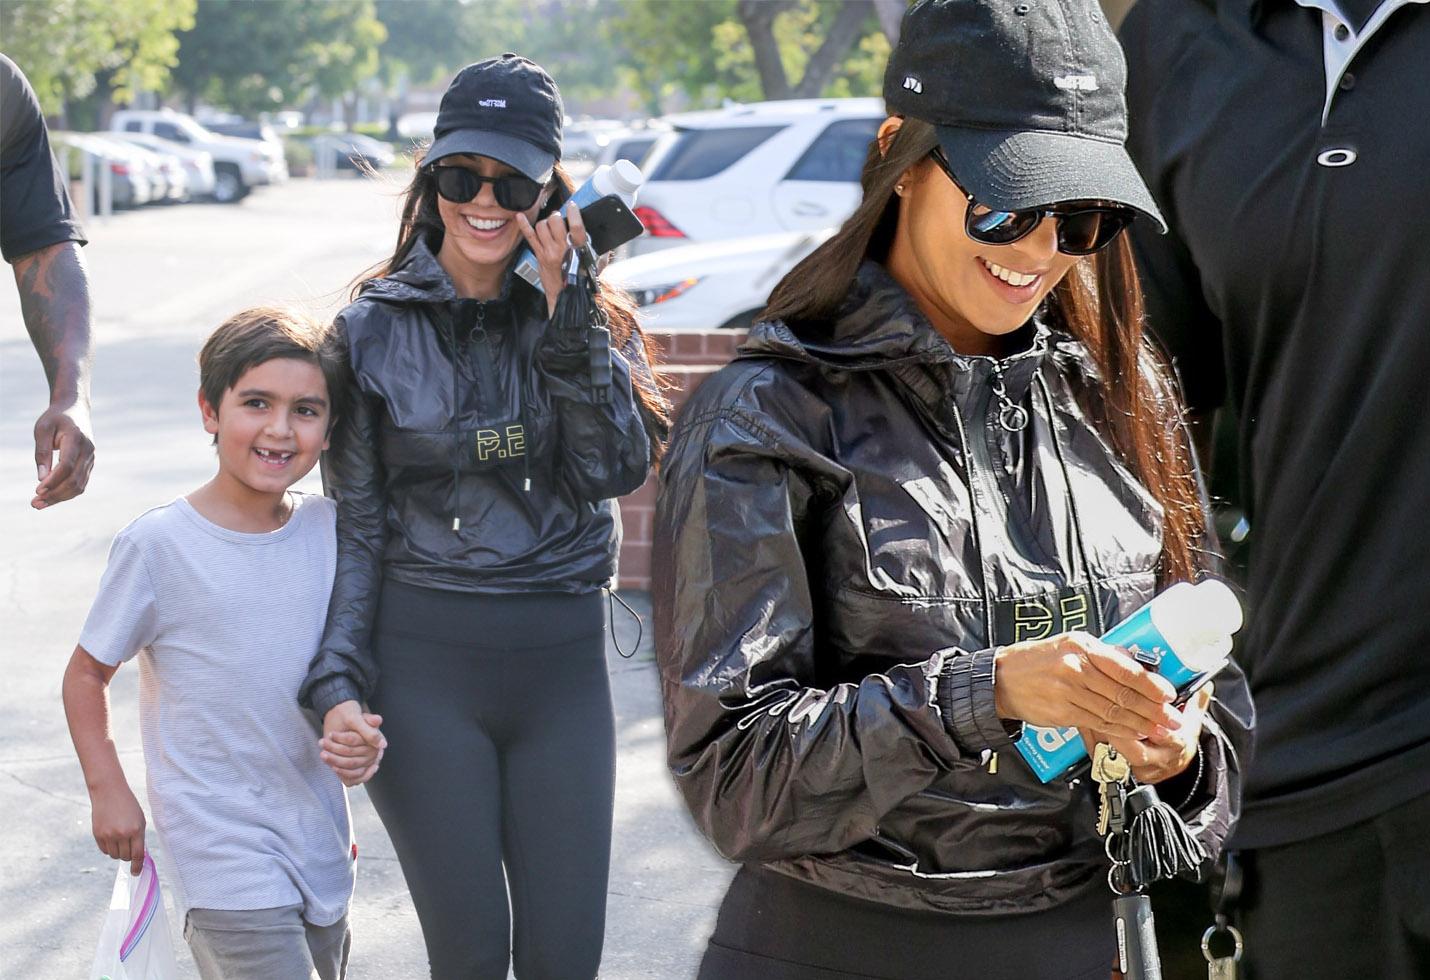 [VIDEO] Kourtney Kardashian Looks Happier After Banning ...